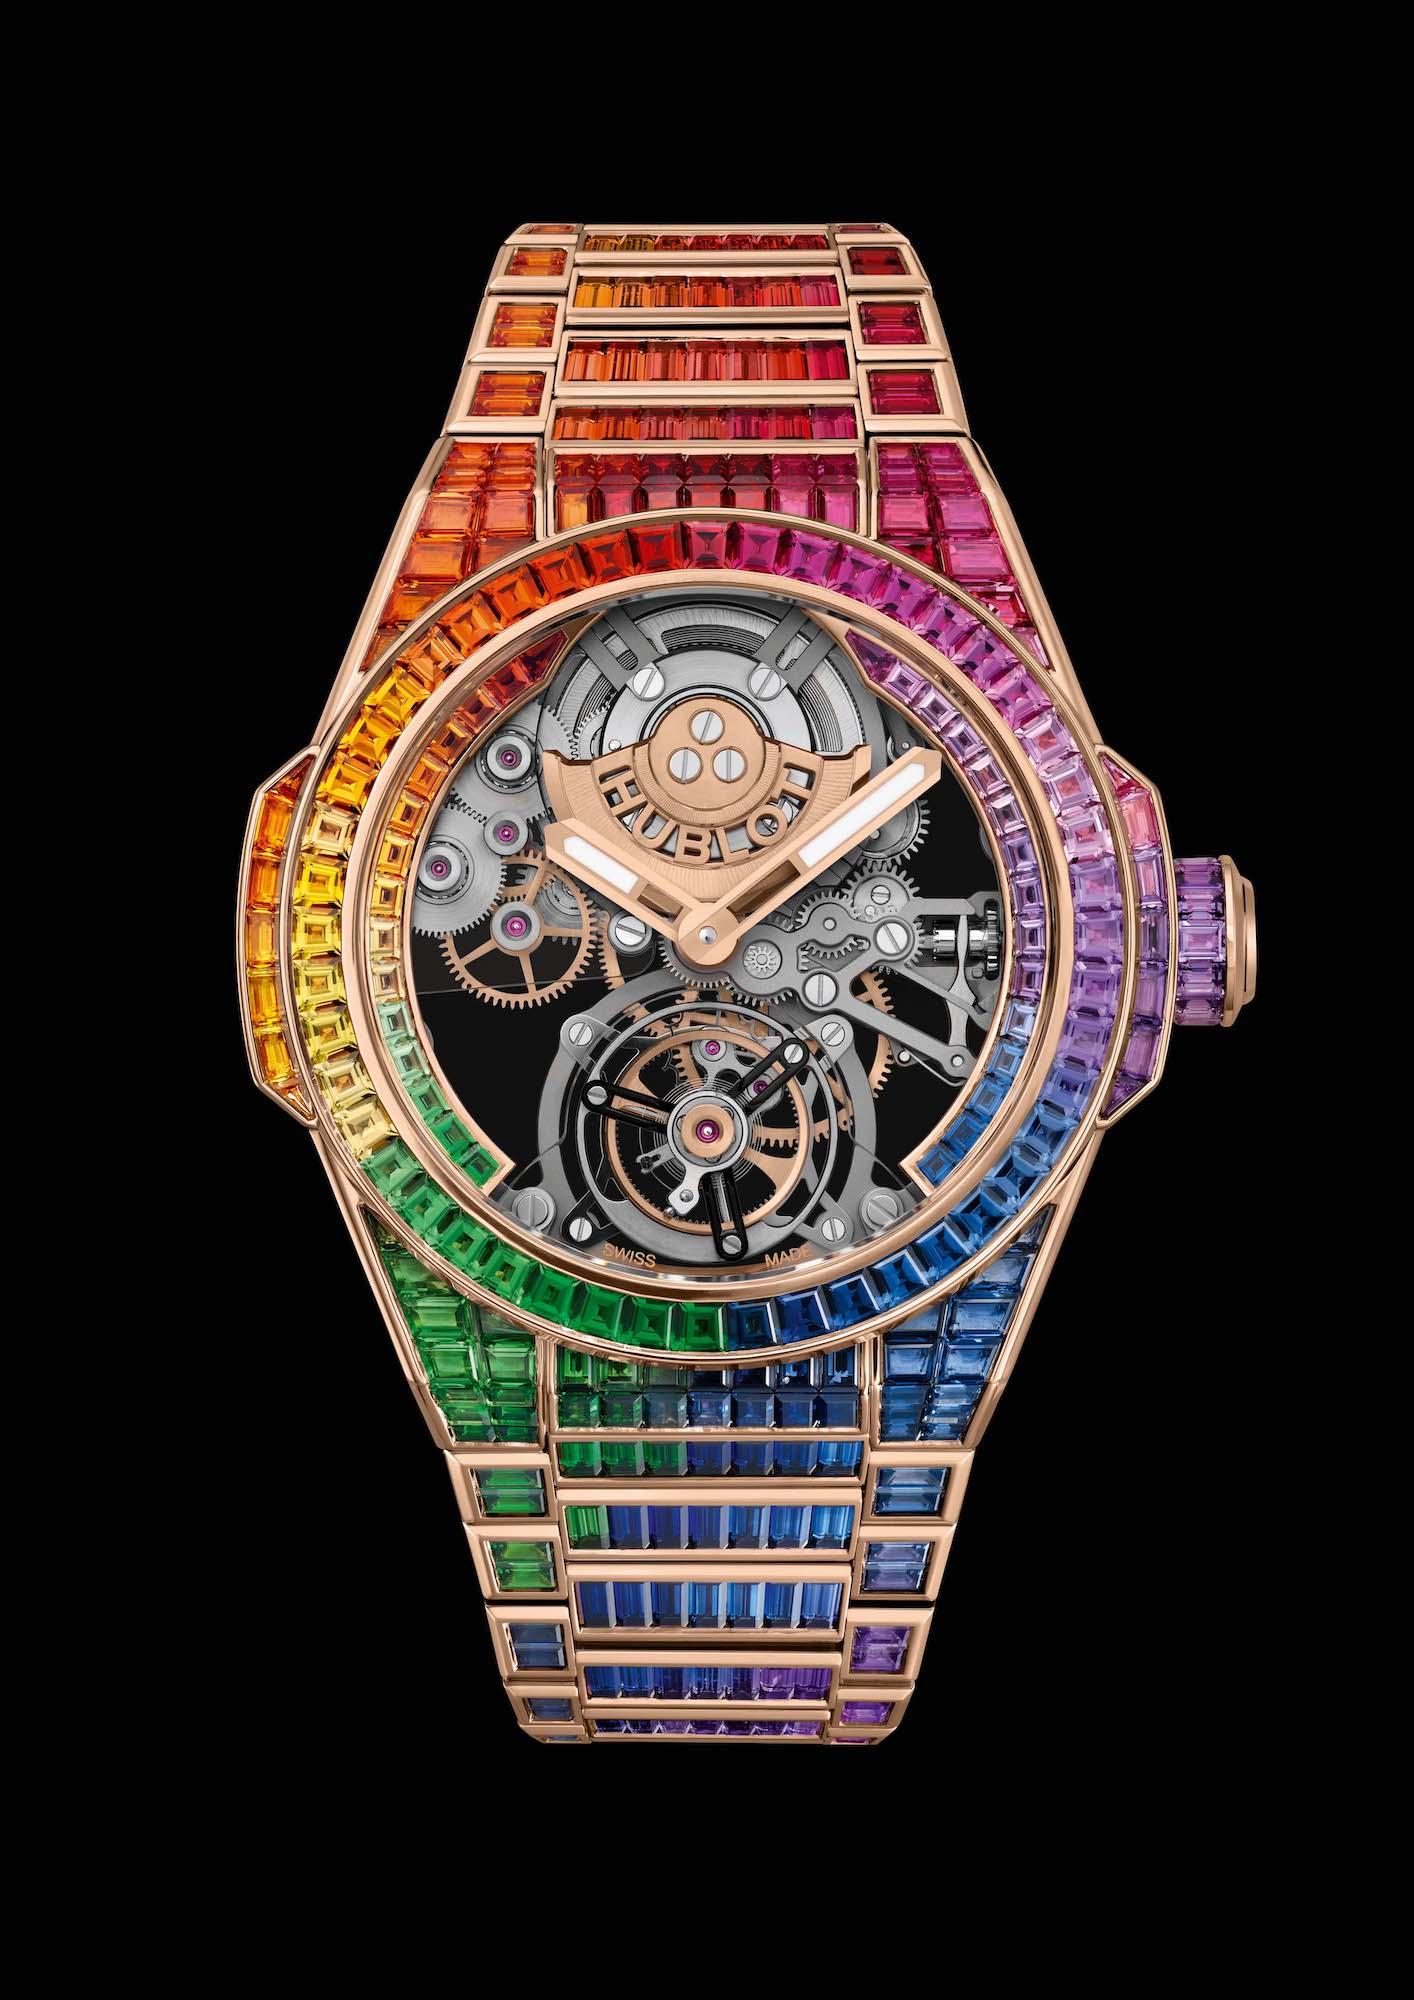 Hublot Big Bang Integral Tourbillon Rainbow 455.OX.9900.OX.9999 Frontal fondo negro